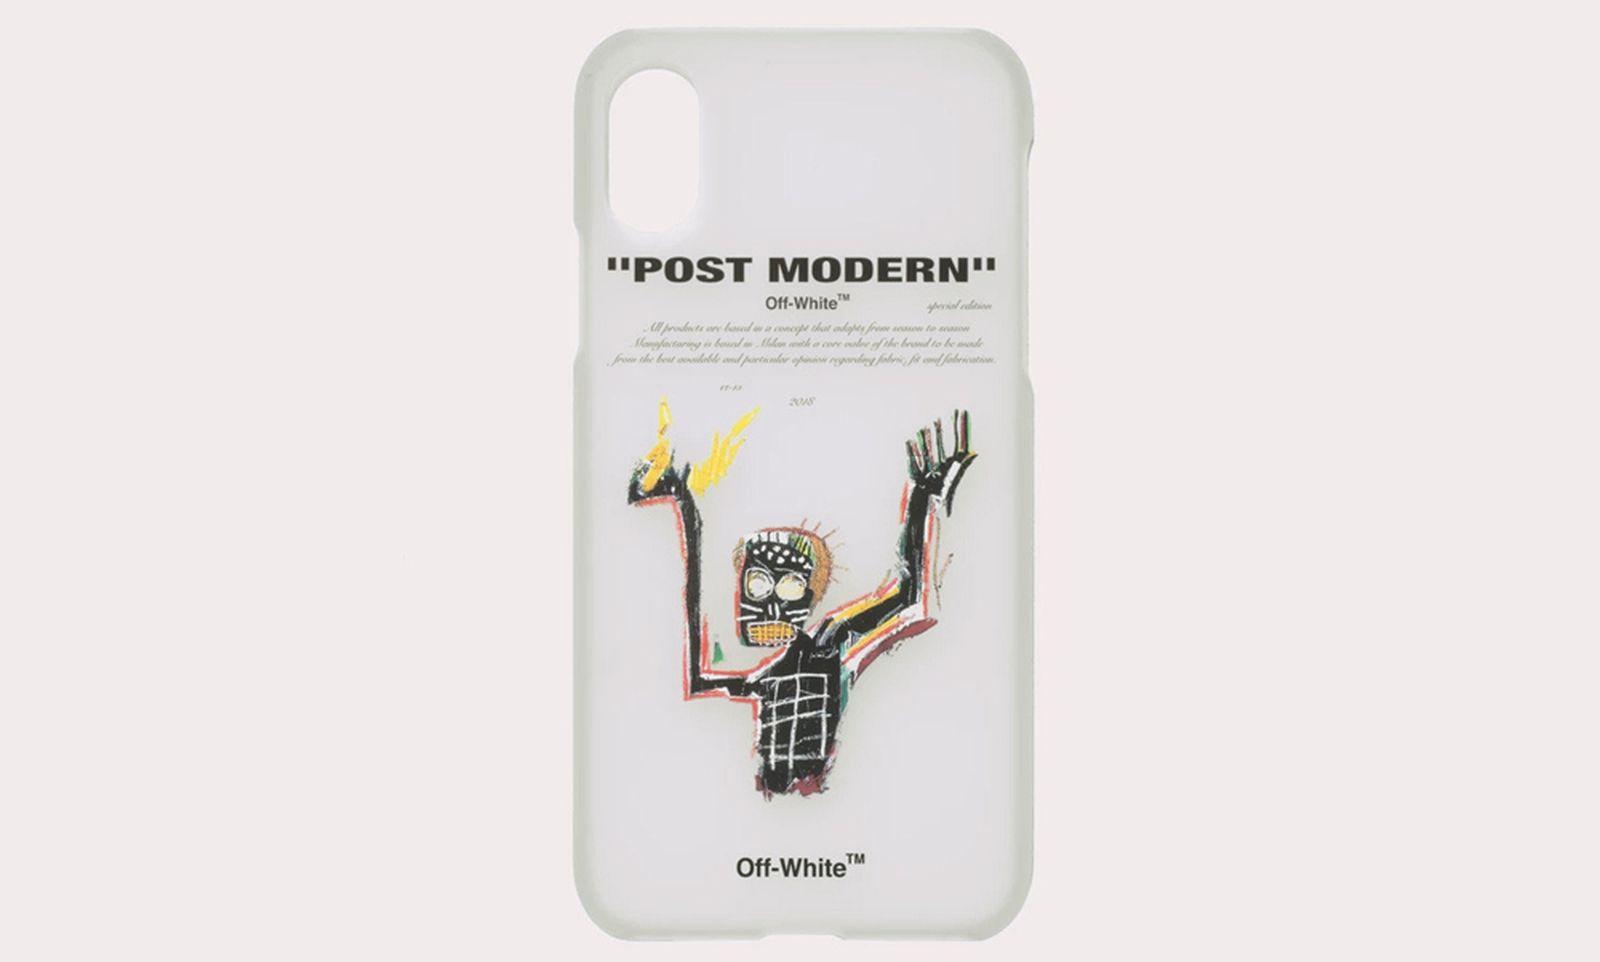 basquiat off white collab iphone case comments Air Jordan 19 Lil Pump Martine Rose